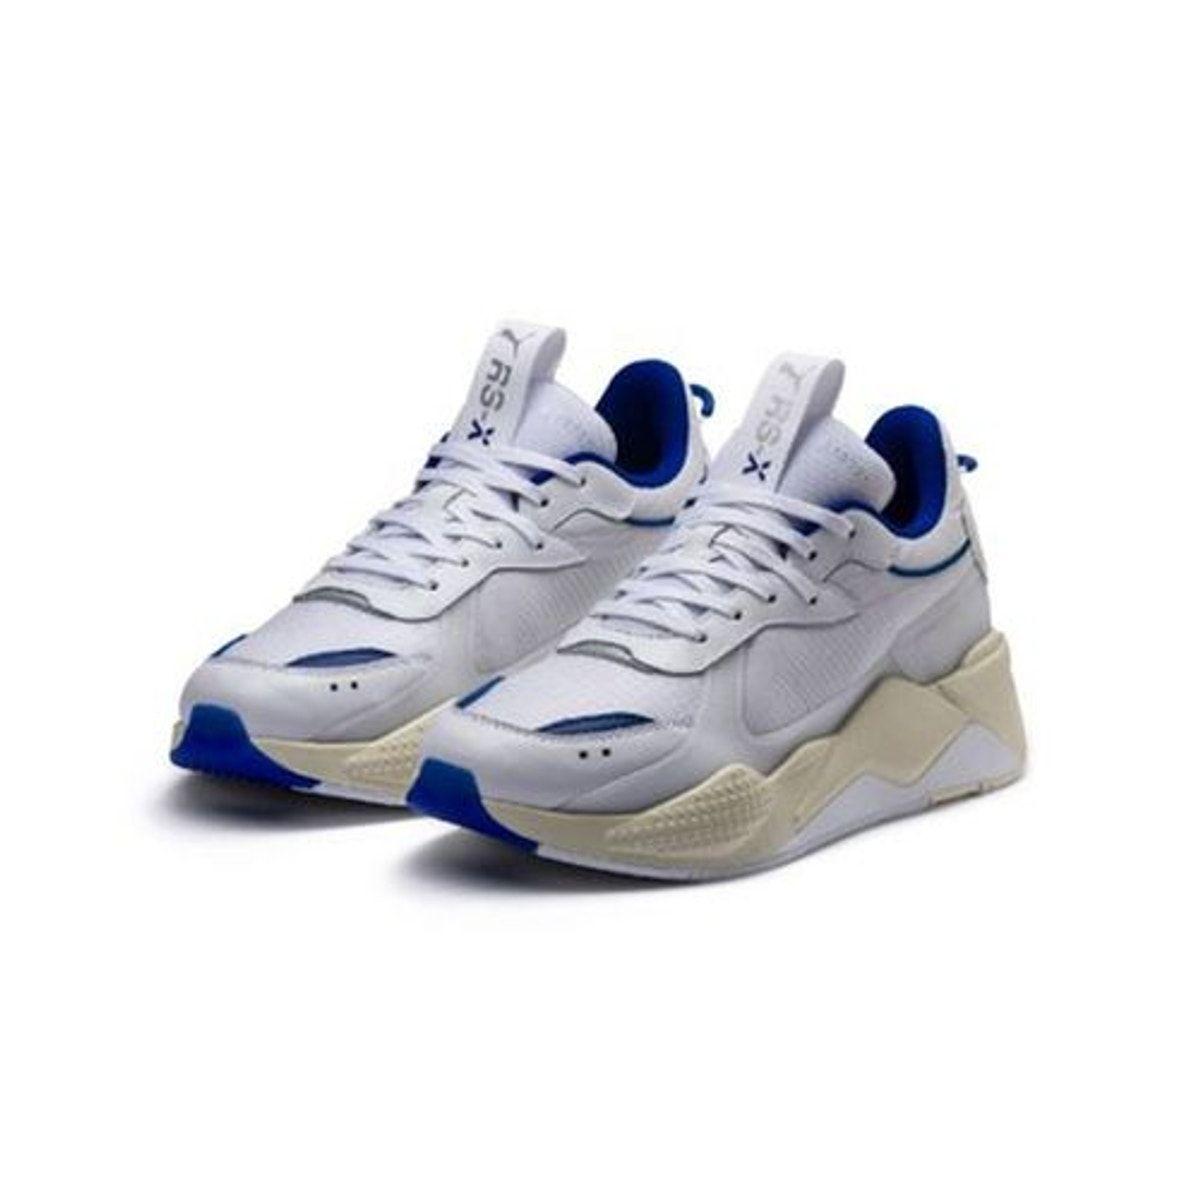 Baskets RS X TECH | Sneakers, Chaussure basket et Baskets